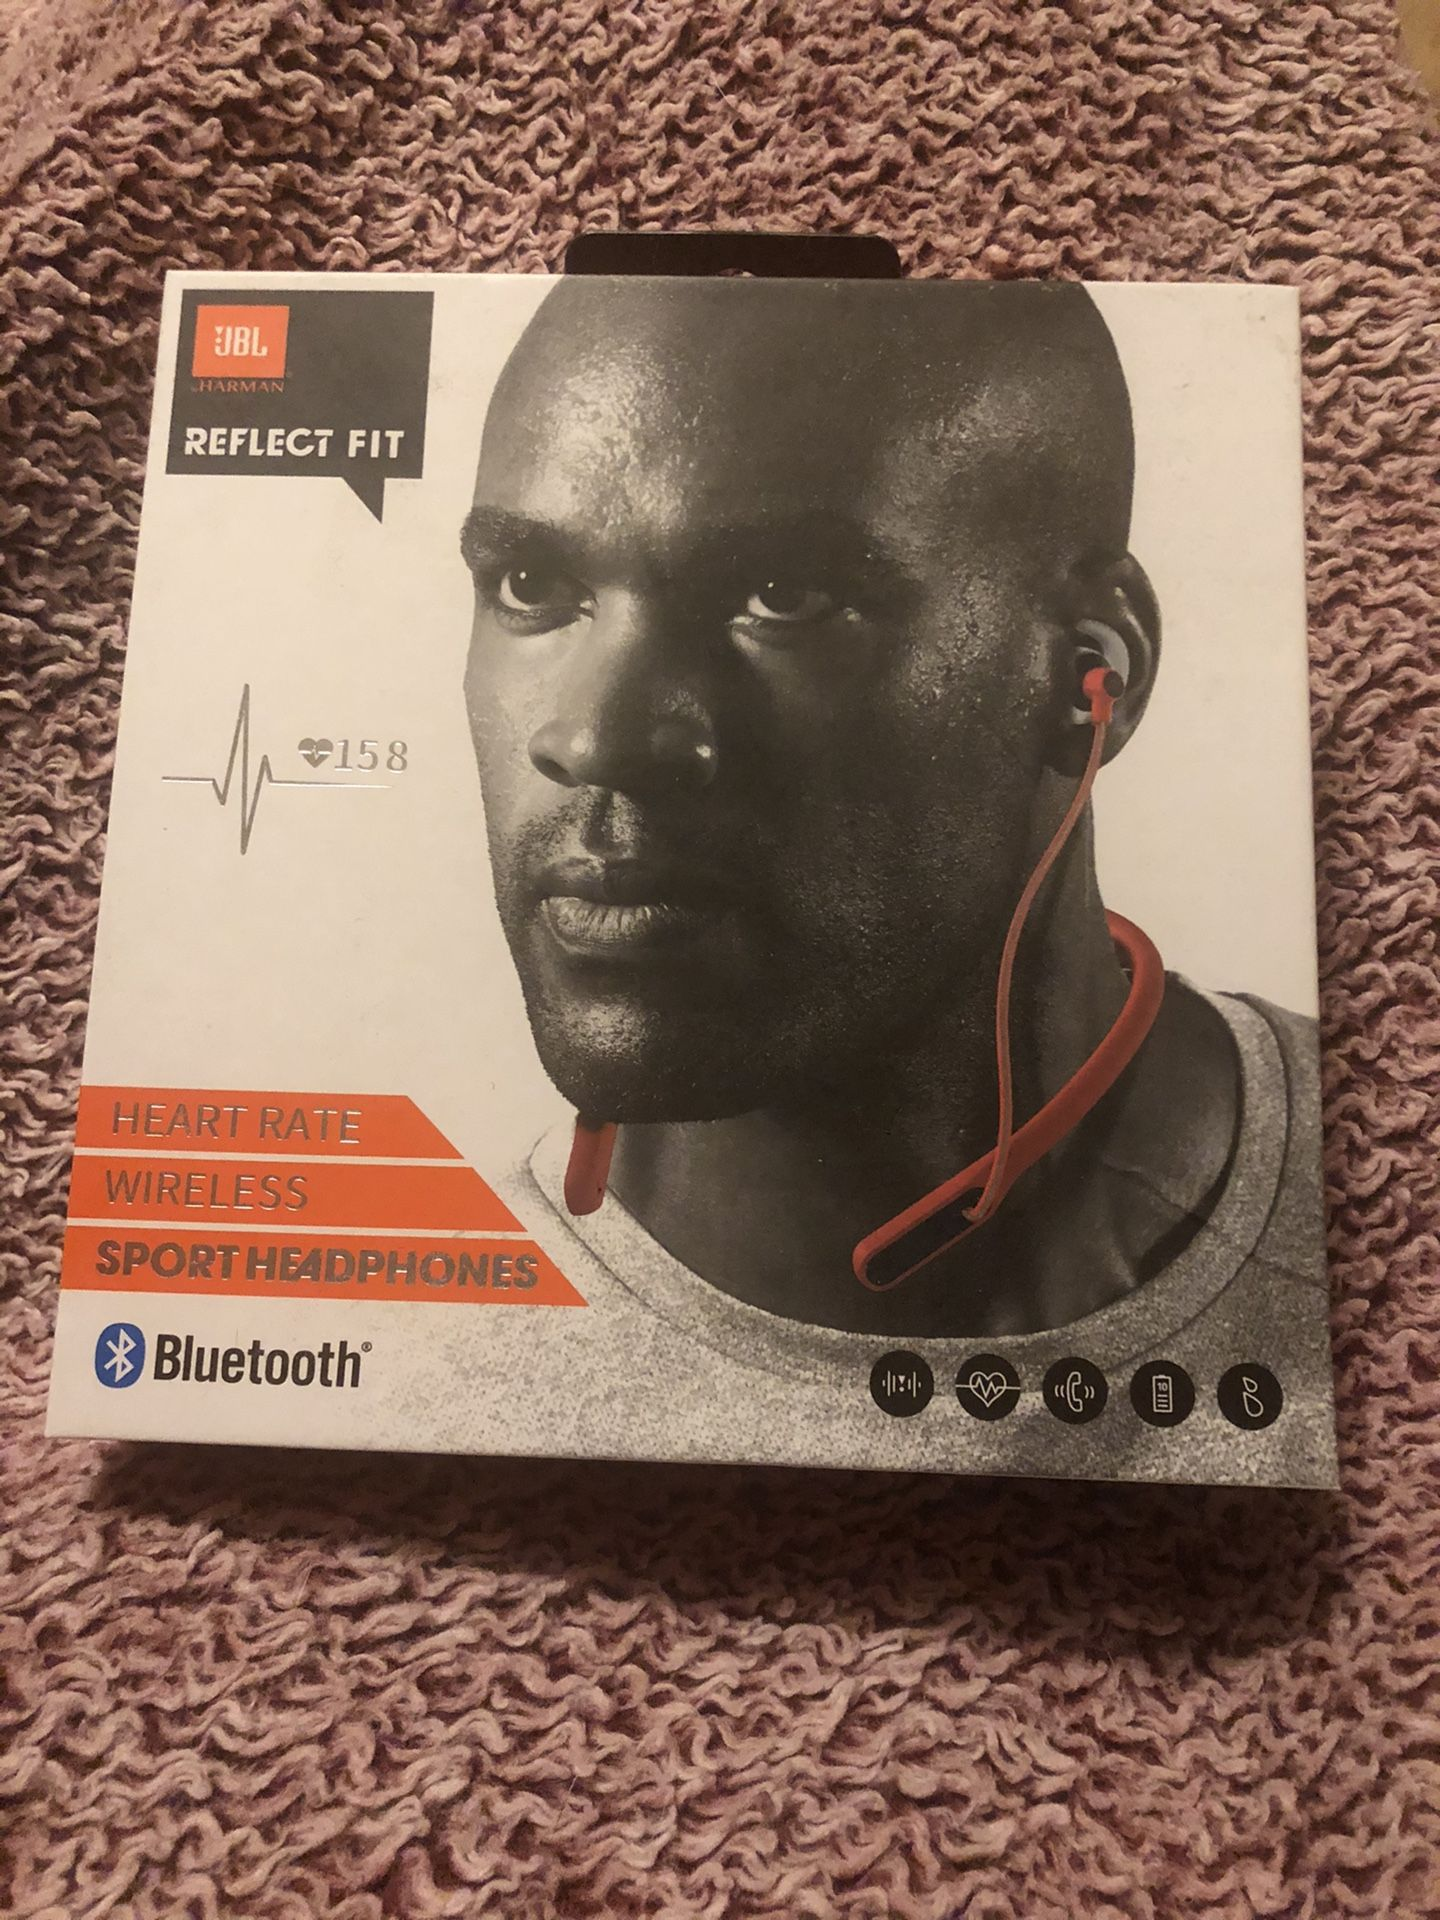 JBL Reflect Fit wireless headphones